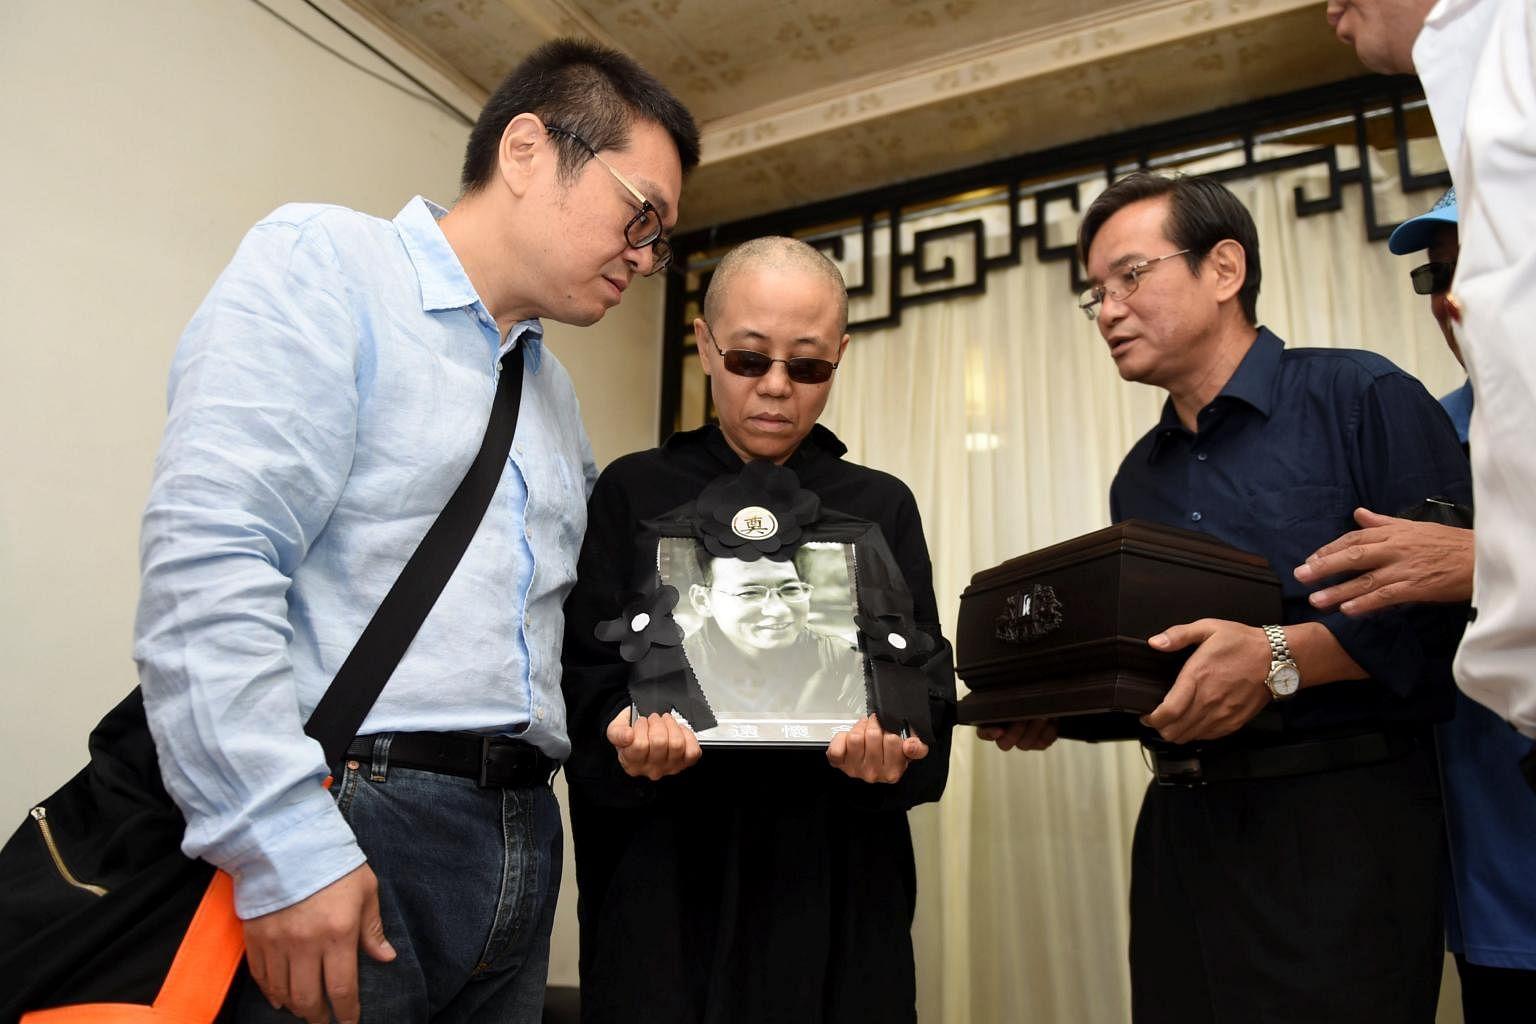 Freedom of Liu Xiaobo's widow a priority